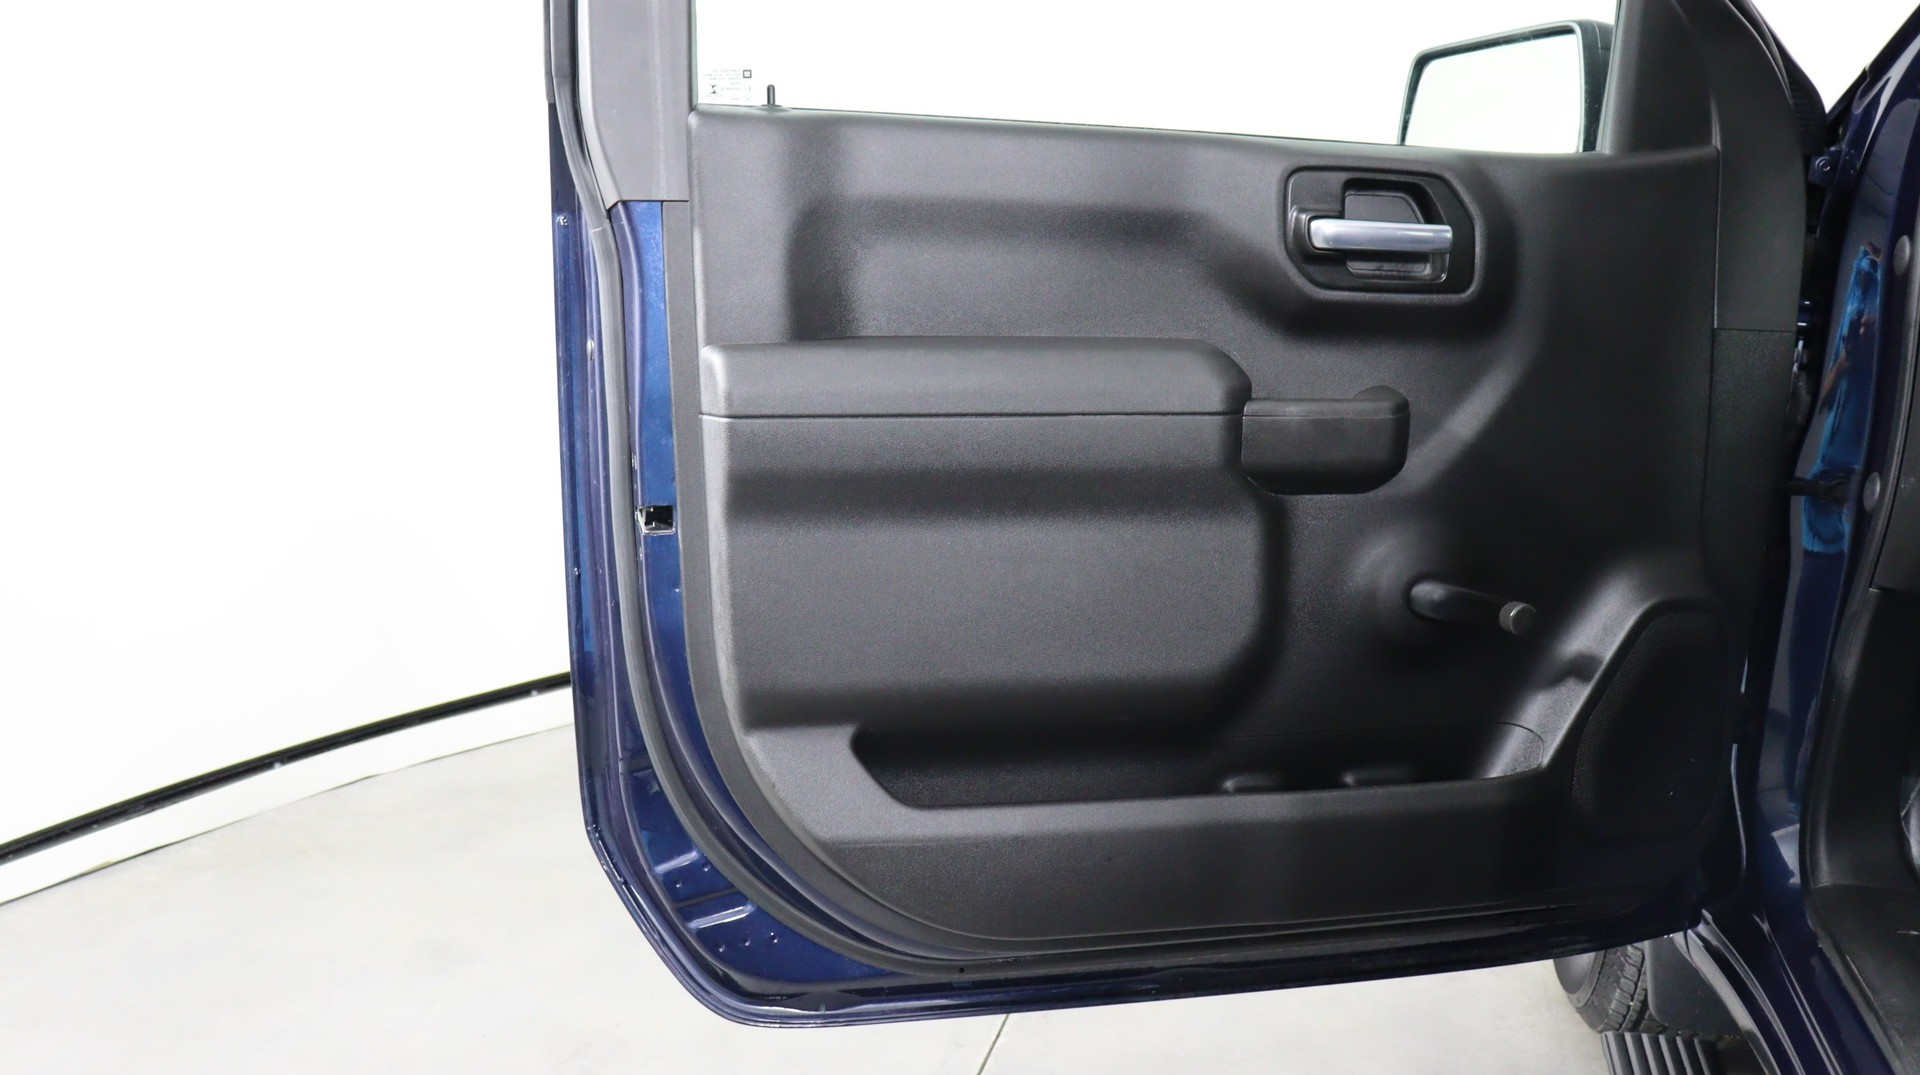 Carvix - Used vehicle - Truck CHEVROLET SILVERADO 1500 2020